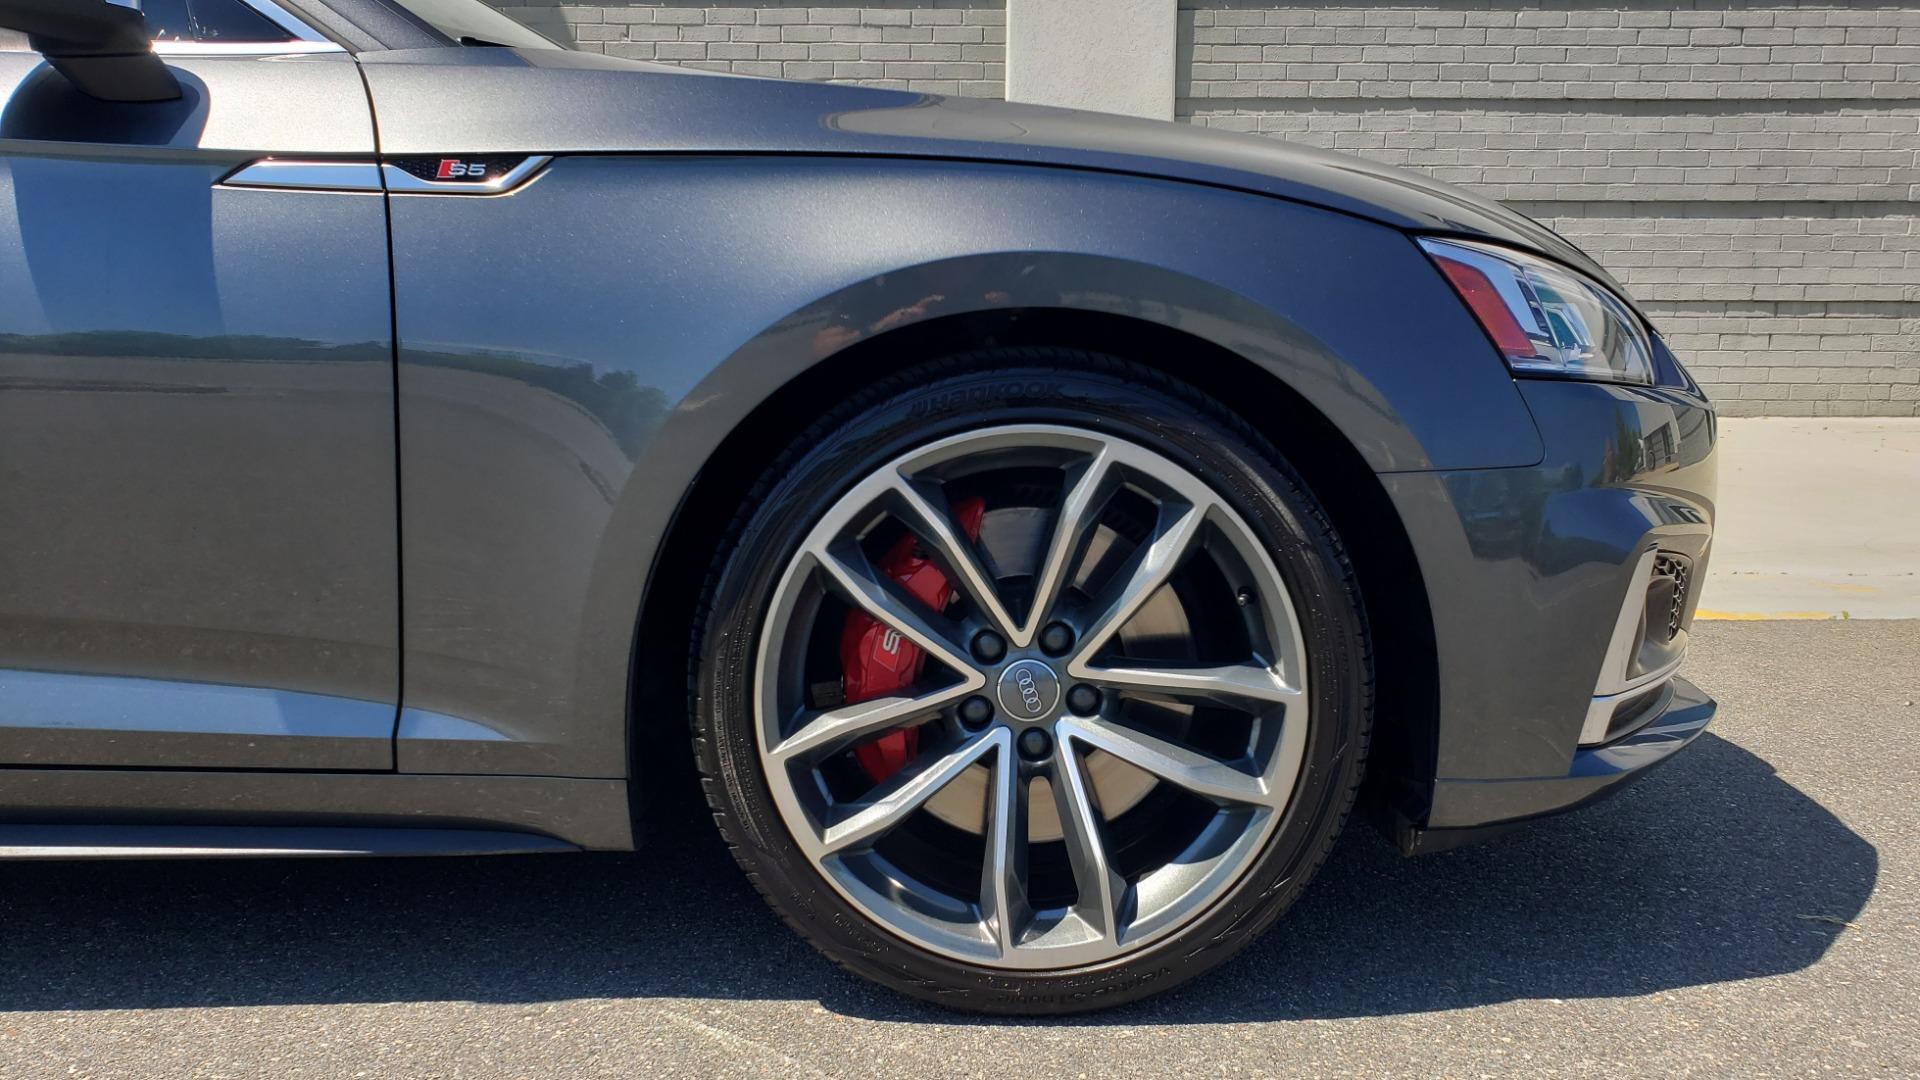 Used 2018 Audi S5 SPORTBACK PRESTIGE S-SPORT / NAV / SUNROOF / HUD / B&O SND / REARVIEW for sale $48,995 at Formula Imports in Charlotte NC 28227 75